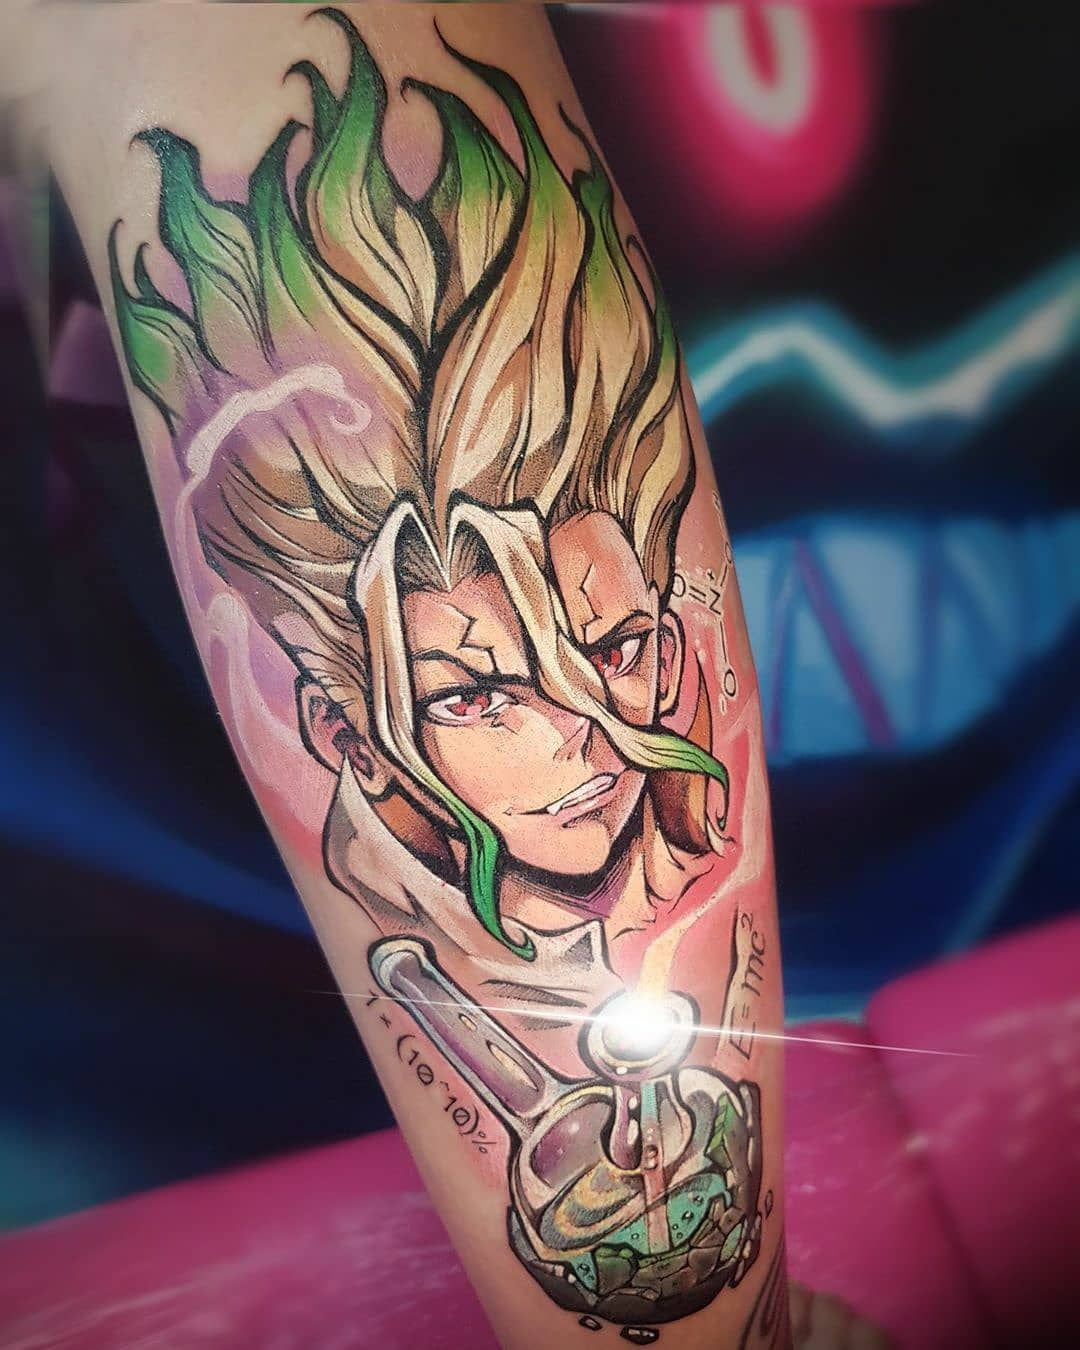 Anime tattoos135k on instagram dr stone tattoo